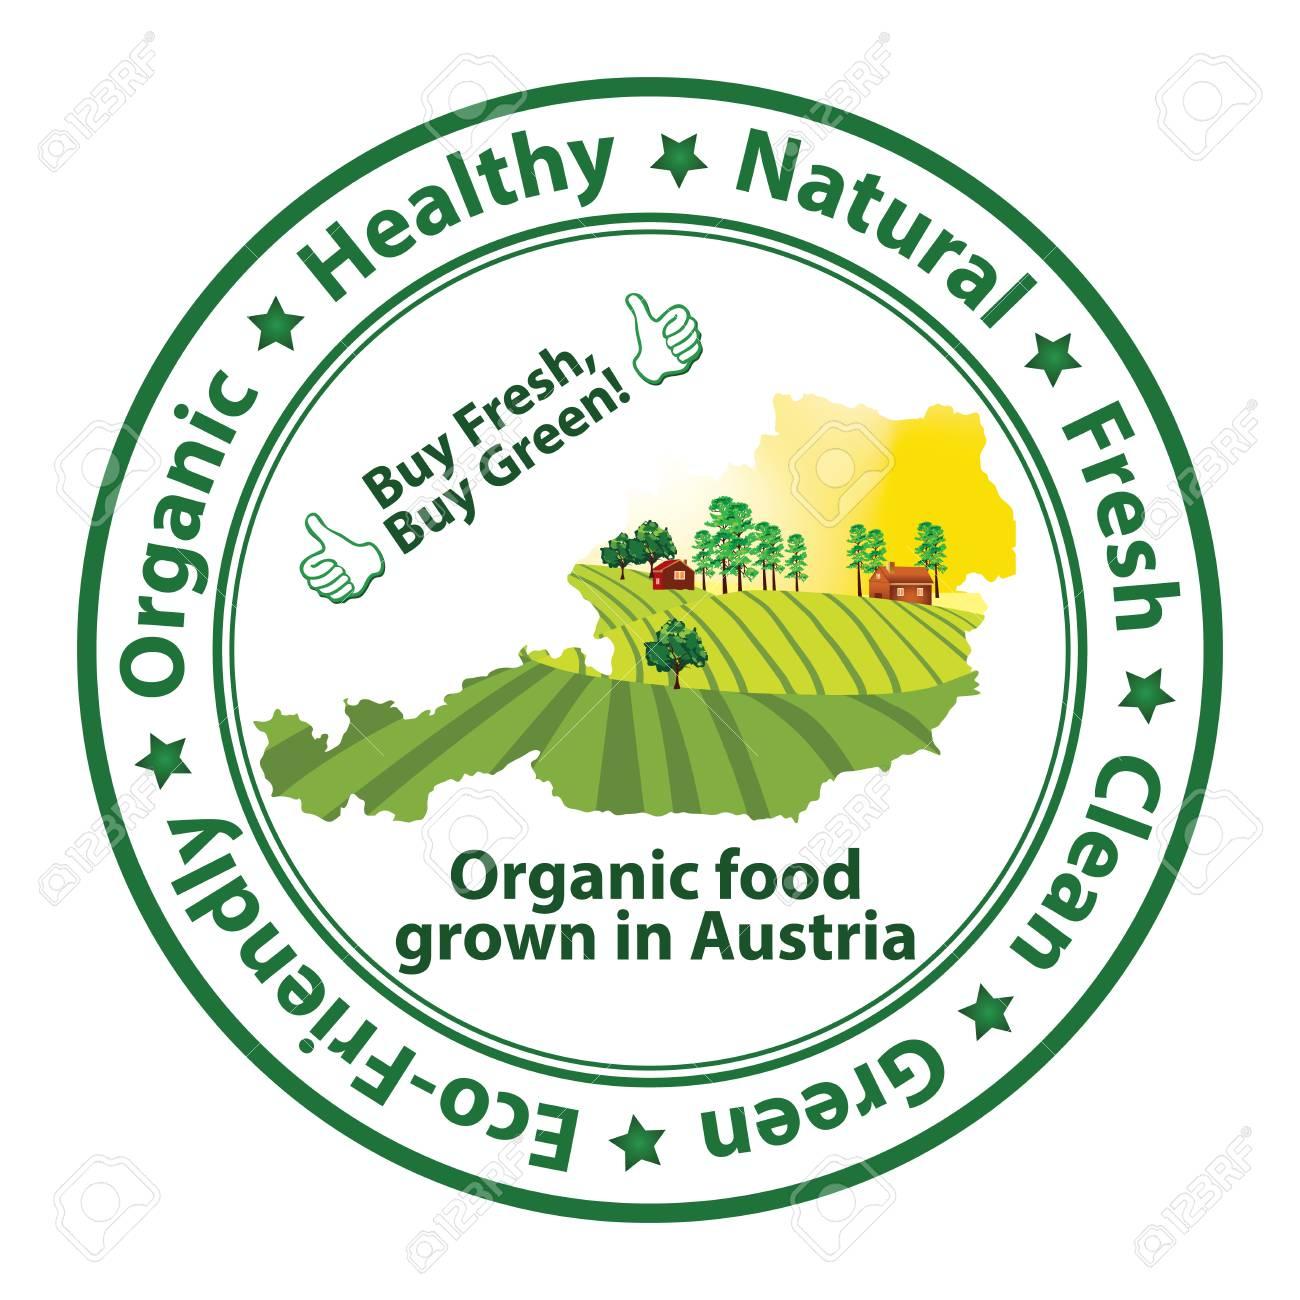 Organic Food Grown In Austria